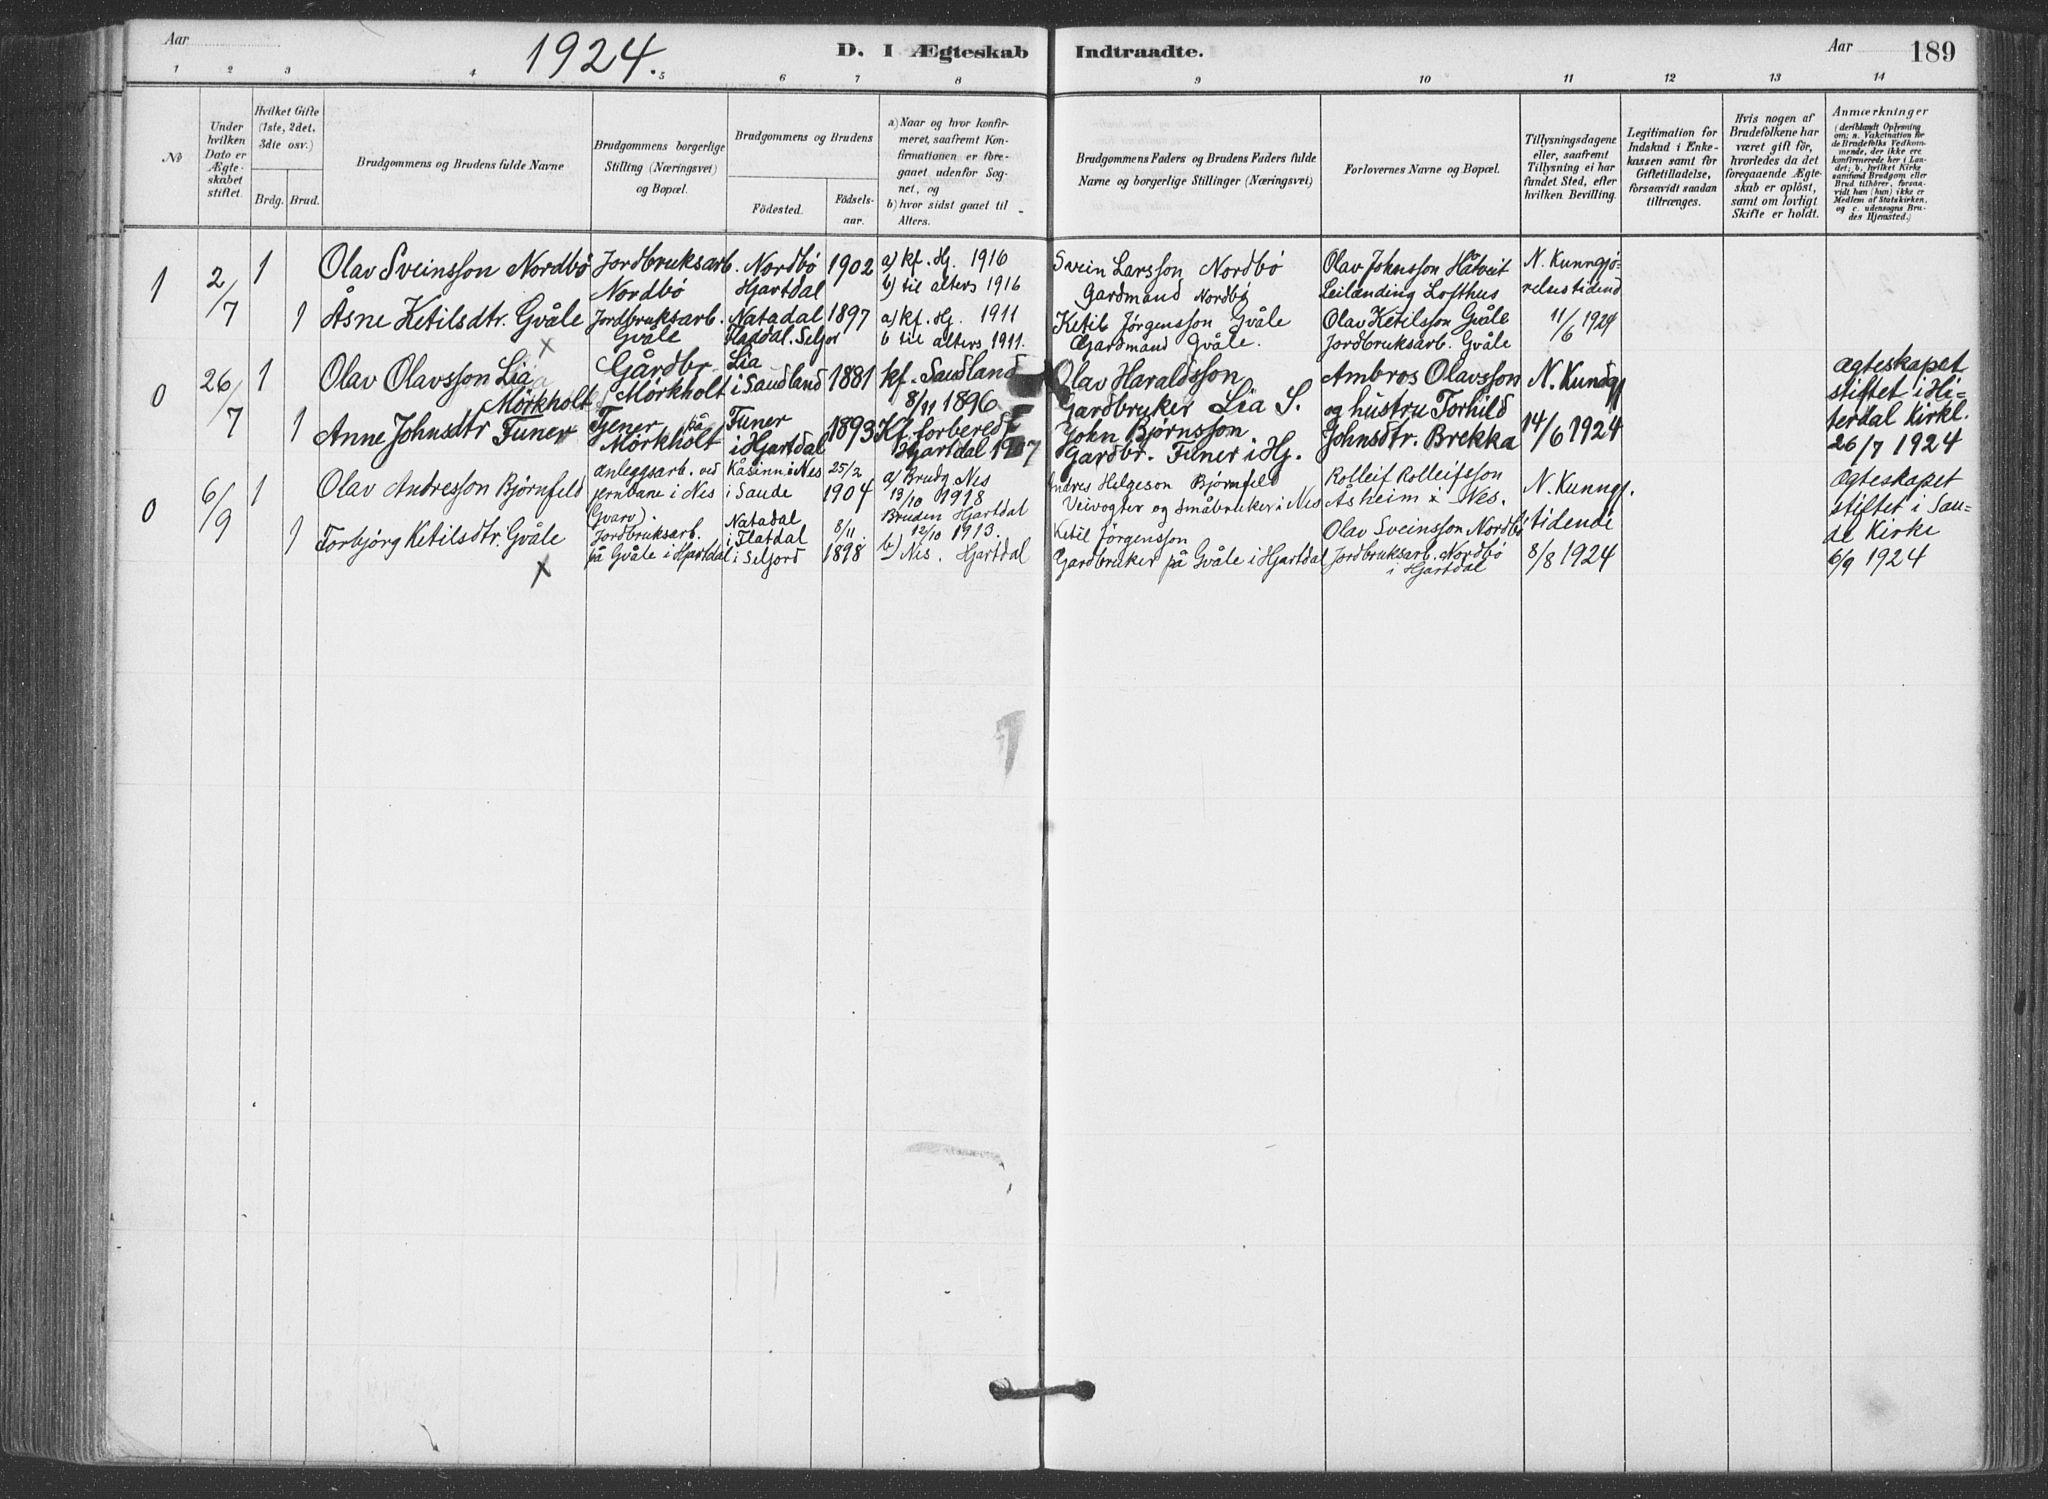 SAKO, Hjartdal kirkebøker, F/Fa/L0010: Ministerialbok nr. I 10, 1880-1929, s. 189